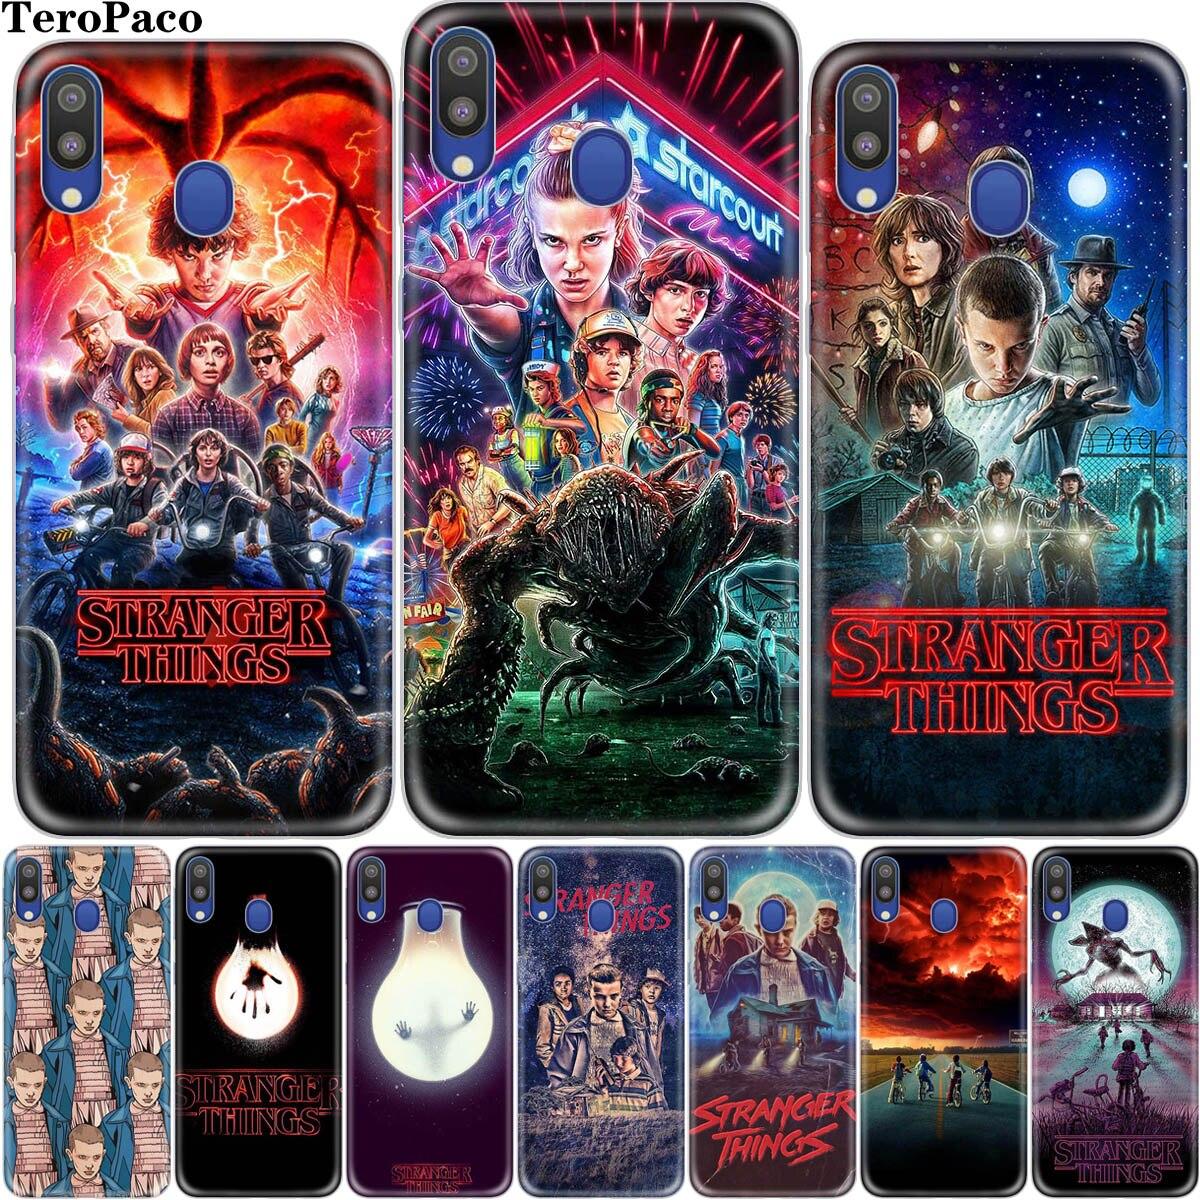 Case For M10 M20 M30 Stranger Things Phone Case For Samsung Galaxy A10 A20E A30 A40 A50S A60 A70 A80 Cover Etui(China)